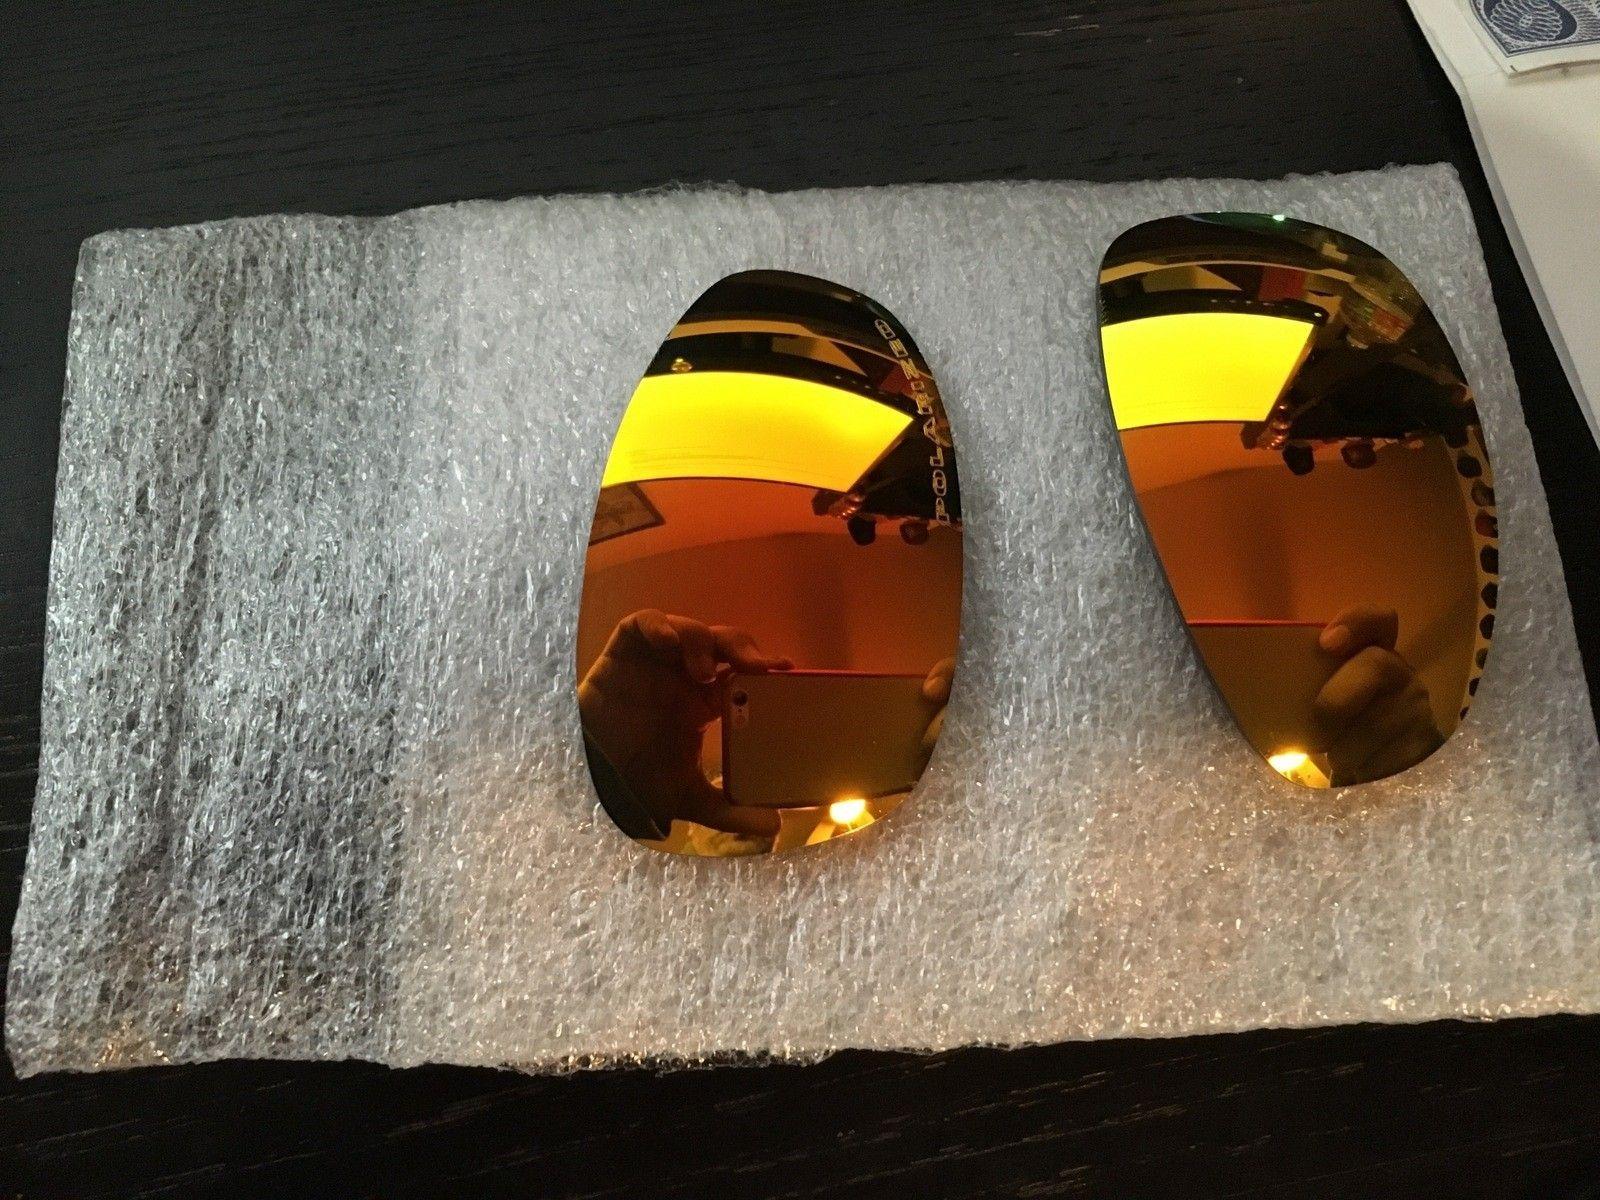 Juliet Polished w Fire Polarized lenses - $275 - 2016-01-17 23.36.41.jpg